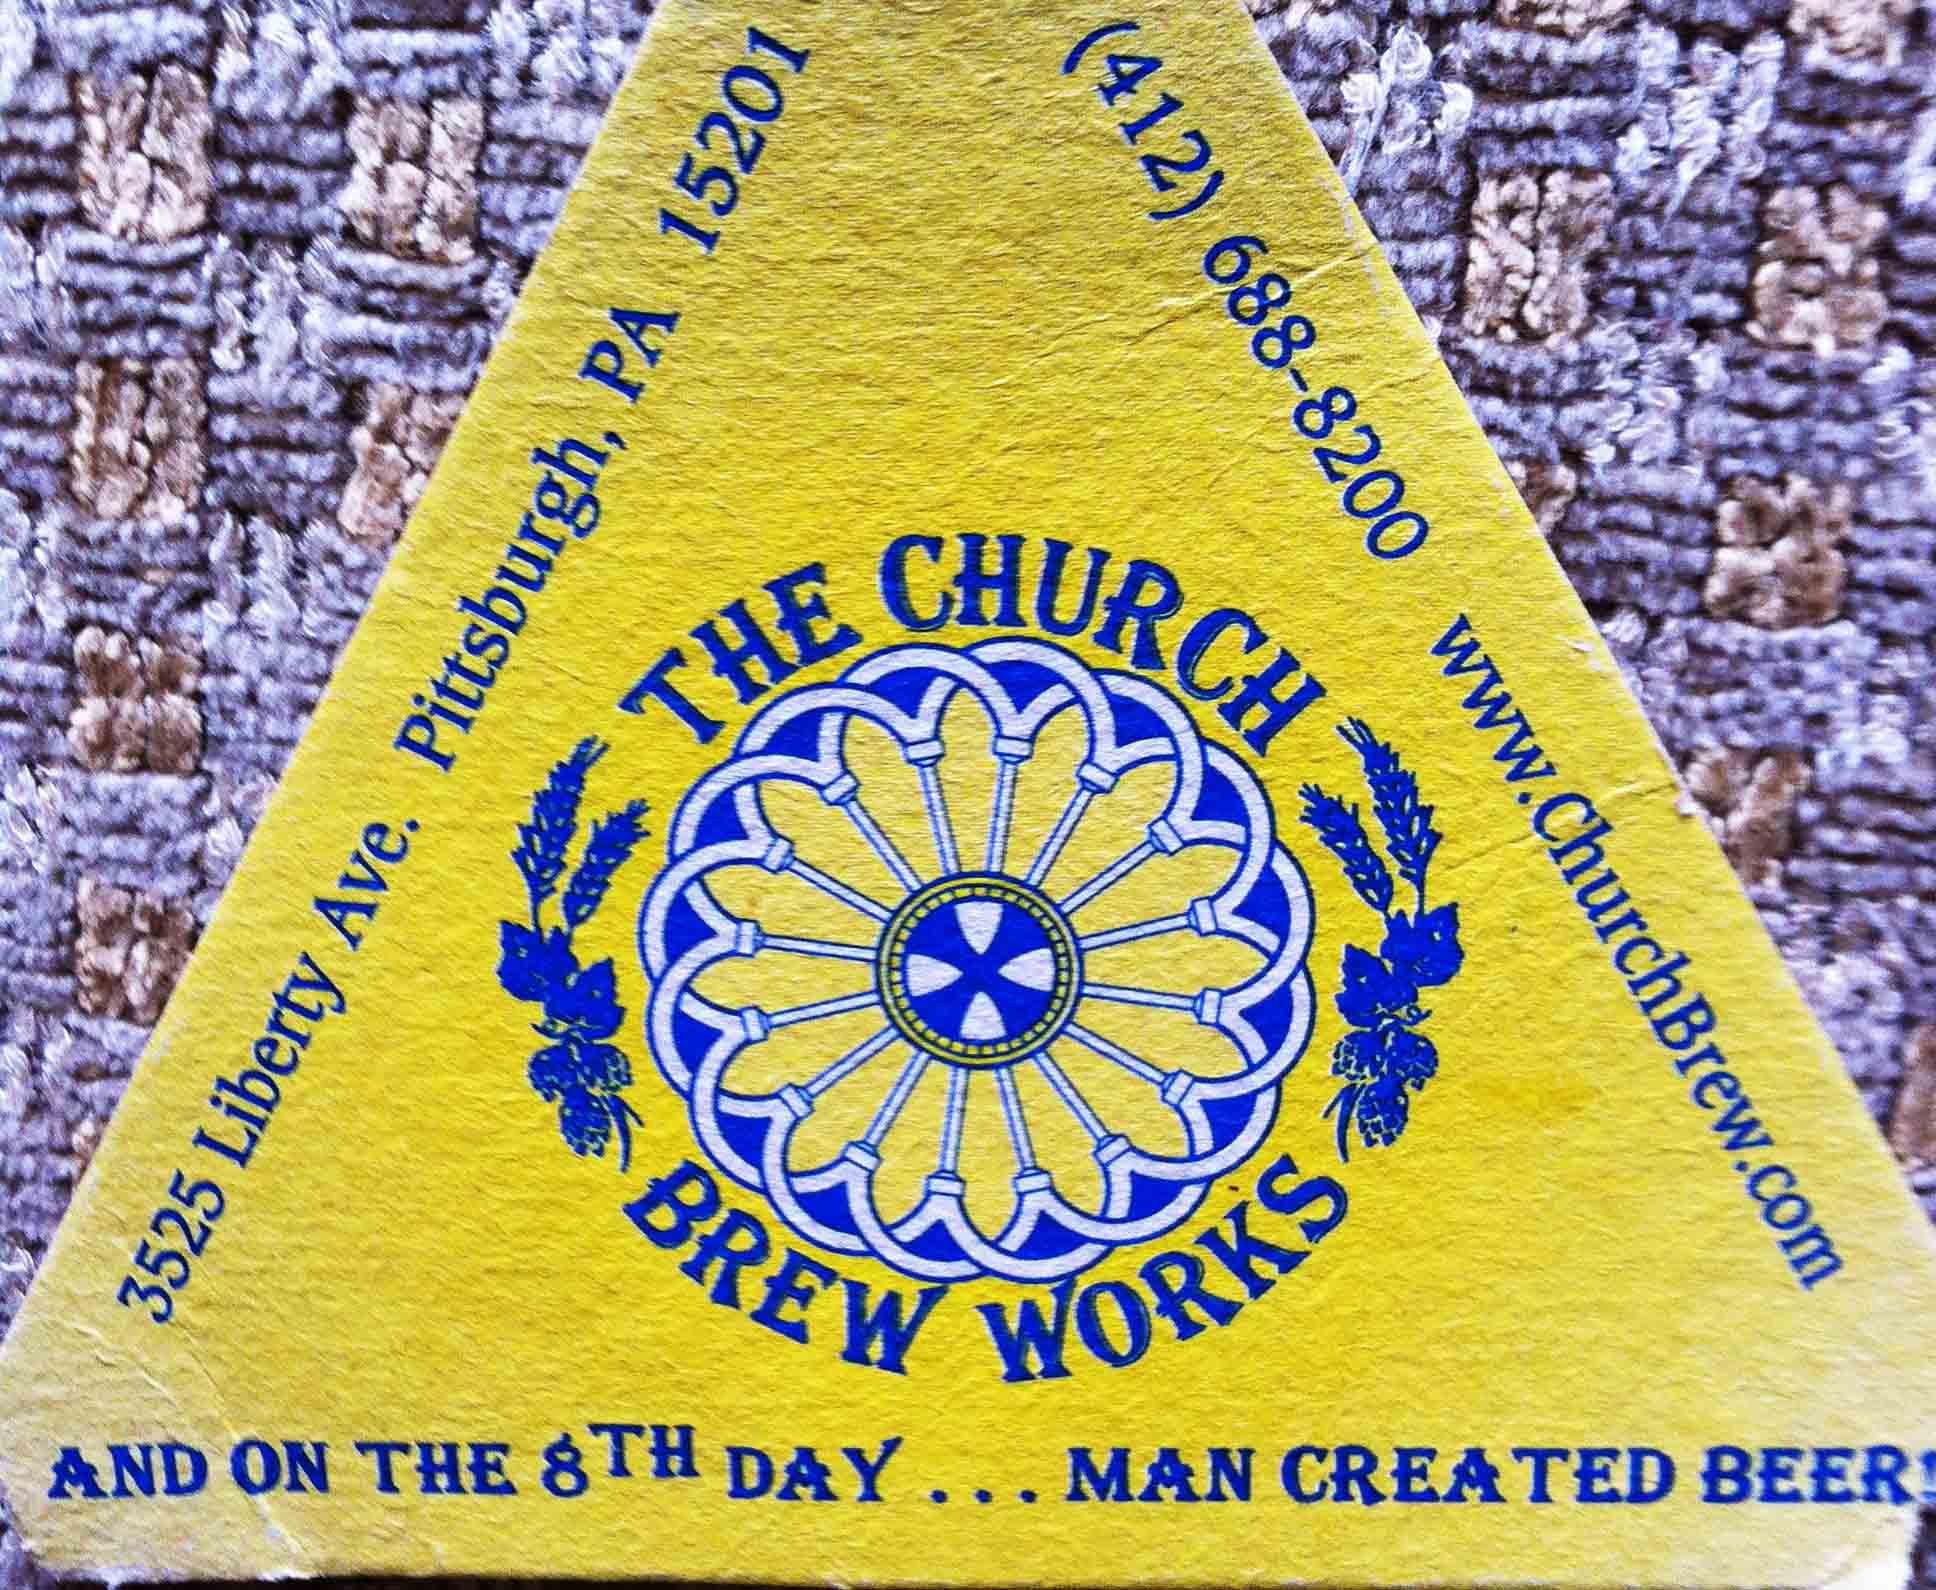 11. Church Brew Works, Pittsburgh PA 1995